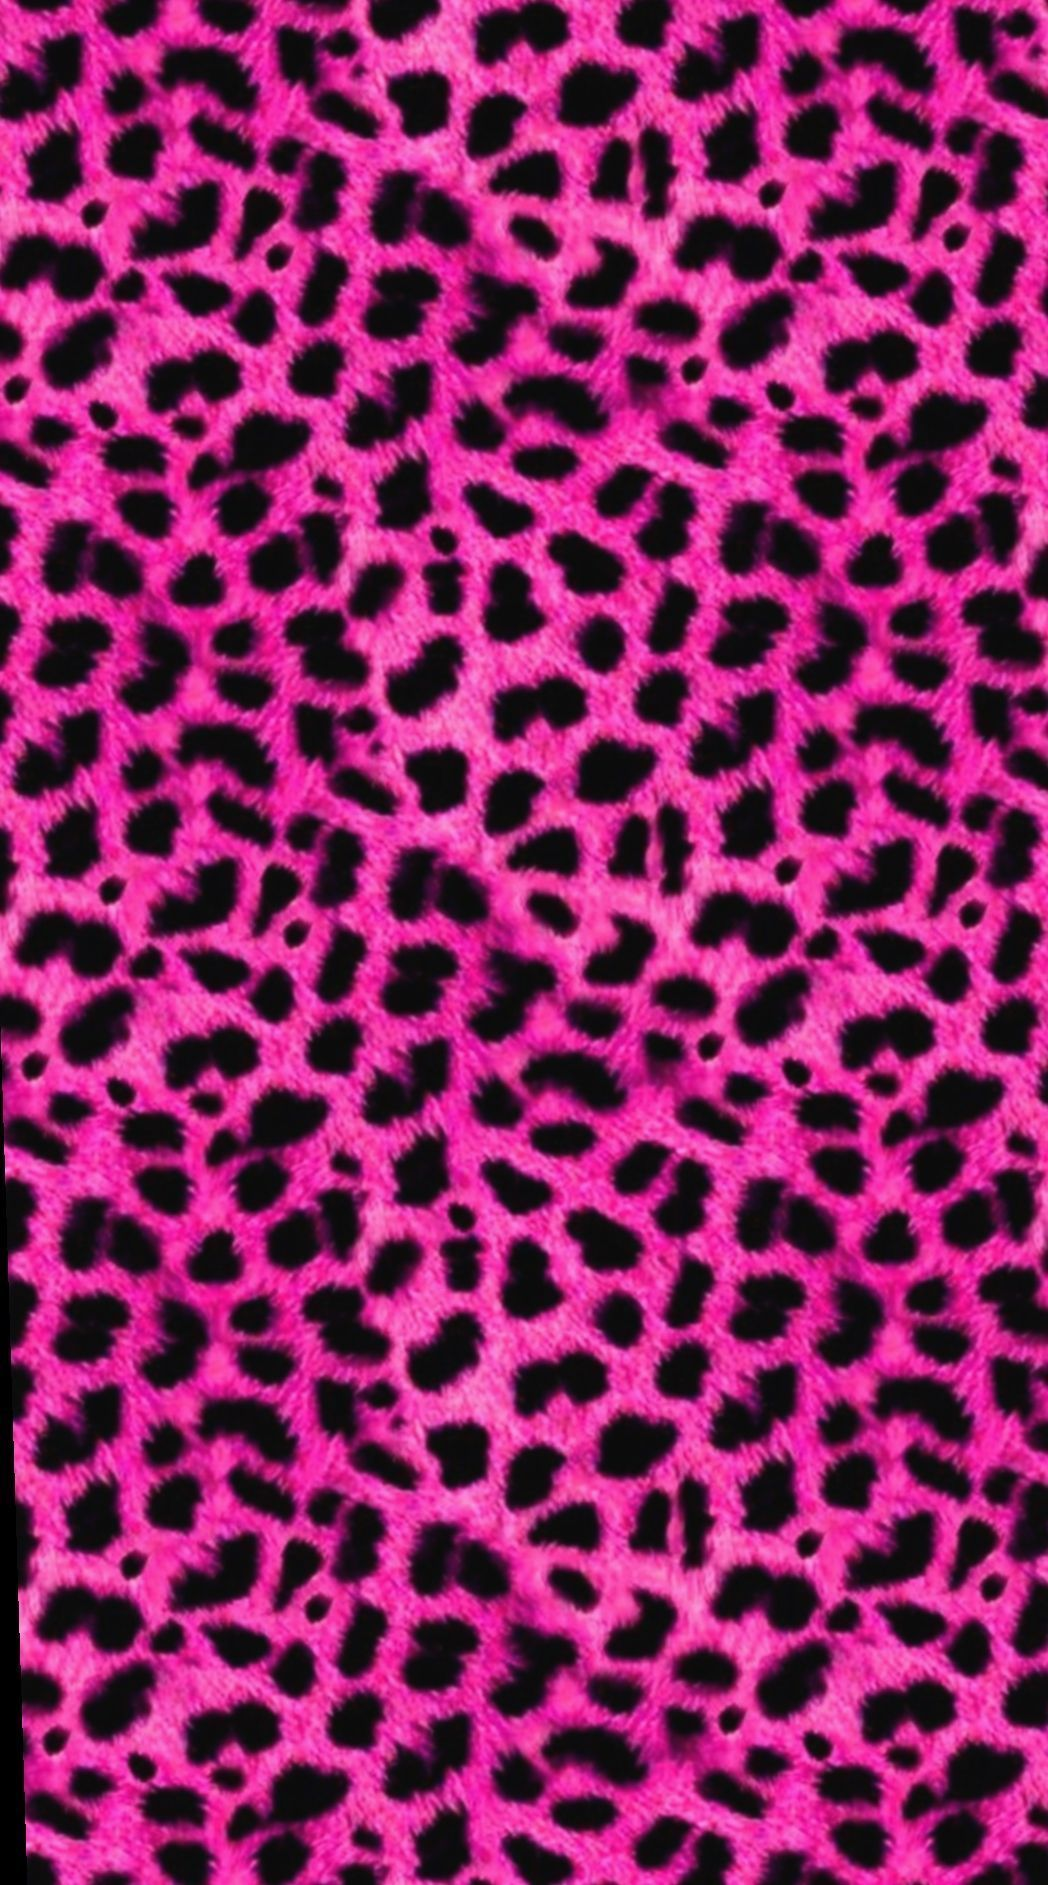 Samsung Wallpaper Glitter Hintergrundbild Tapete Samsung Wallpaper Girly Hint Samsun In 2020 Leopard Print Wallpaper Pink Leopard Wallpaper Pink Wallpaper Iphone